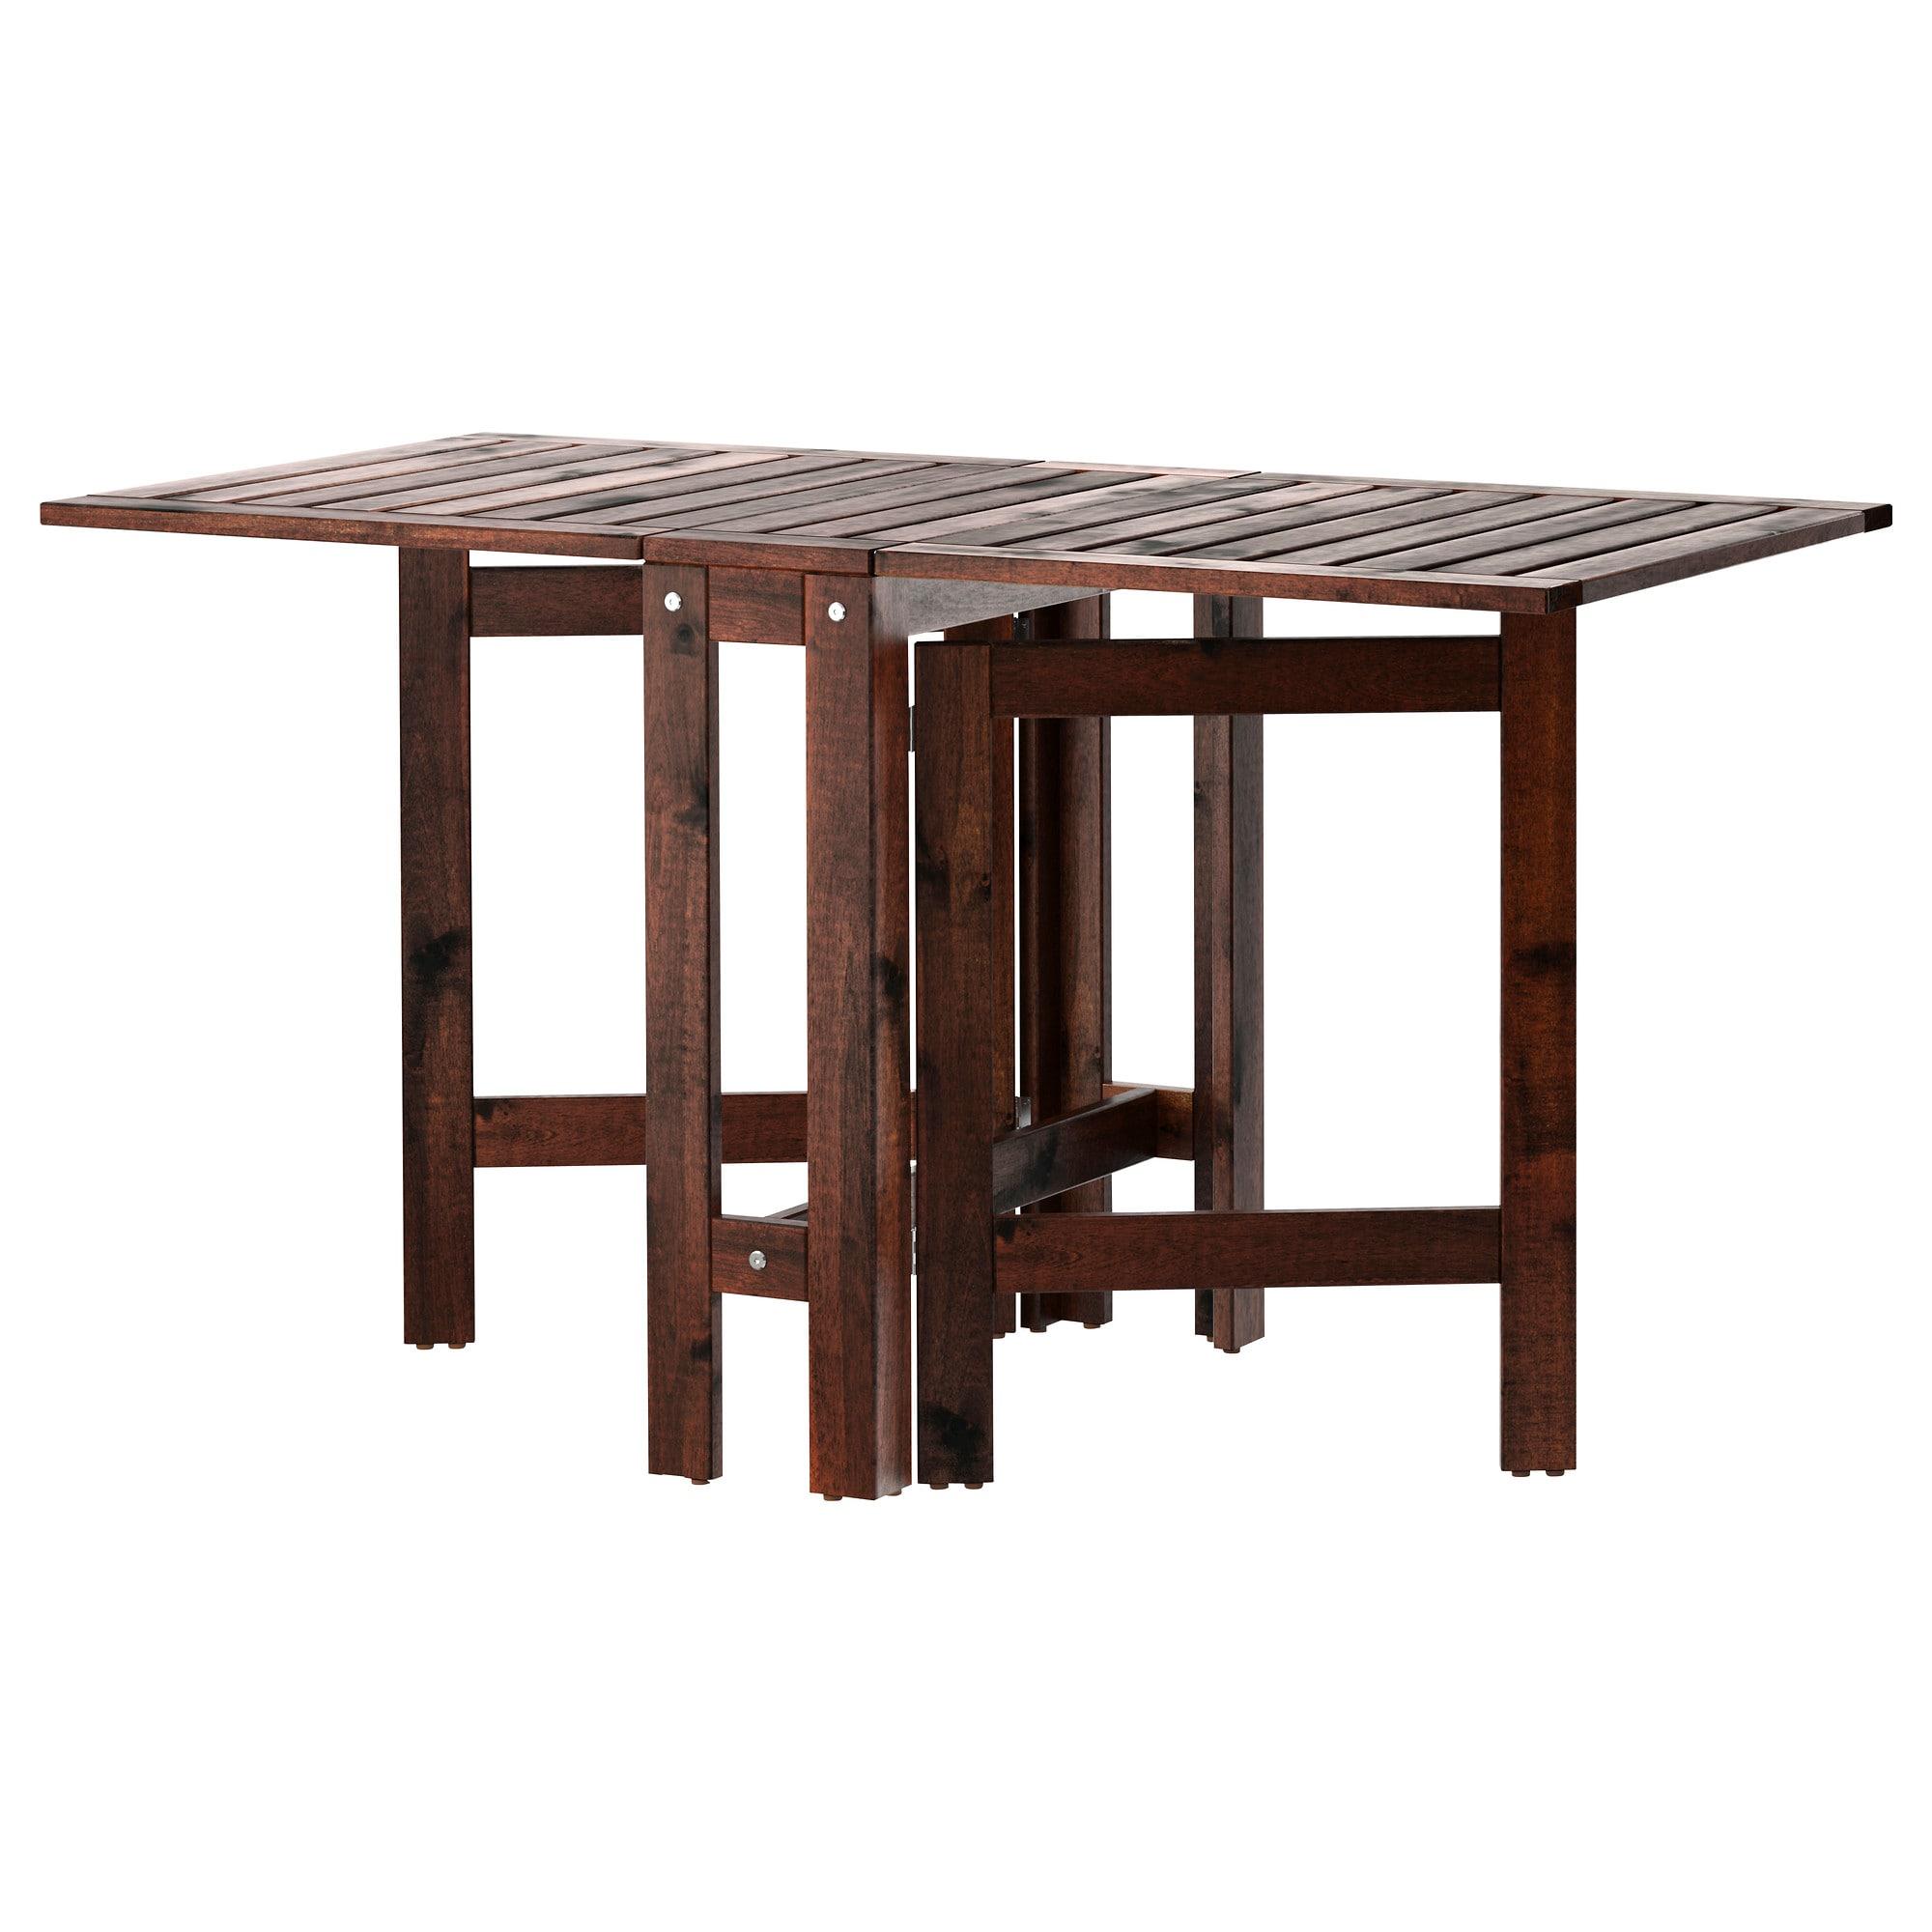 Applaro Table Pliante Exterieur Teinte Brun 20 77 133x62 Cm